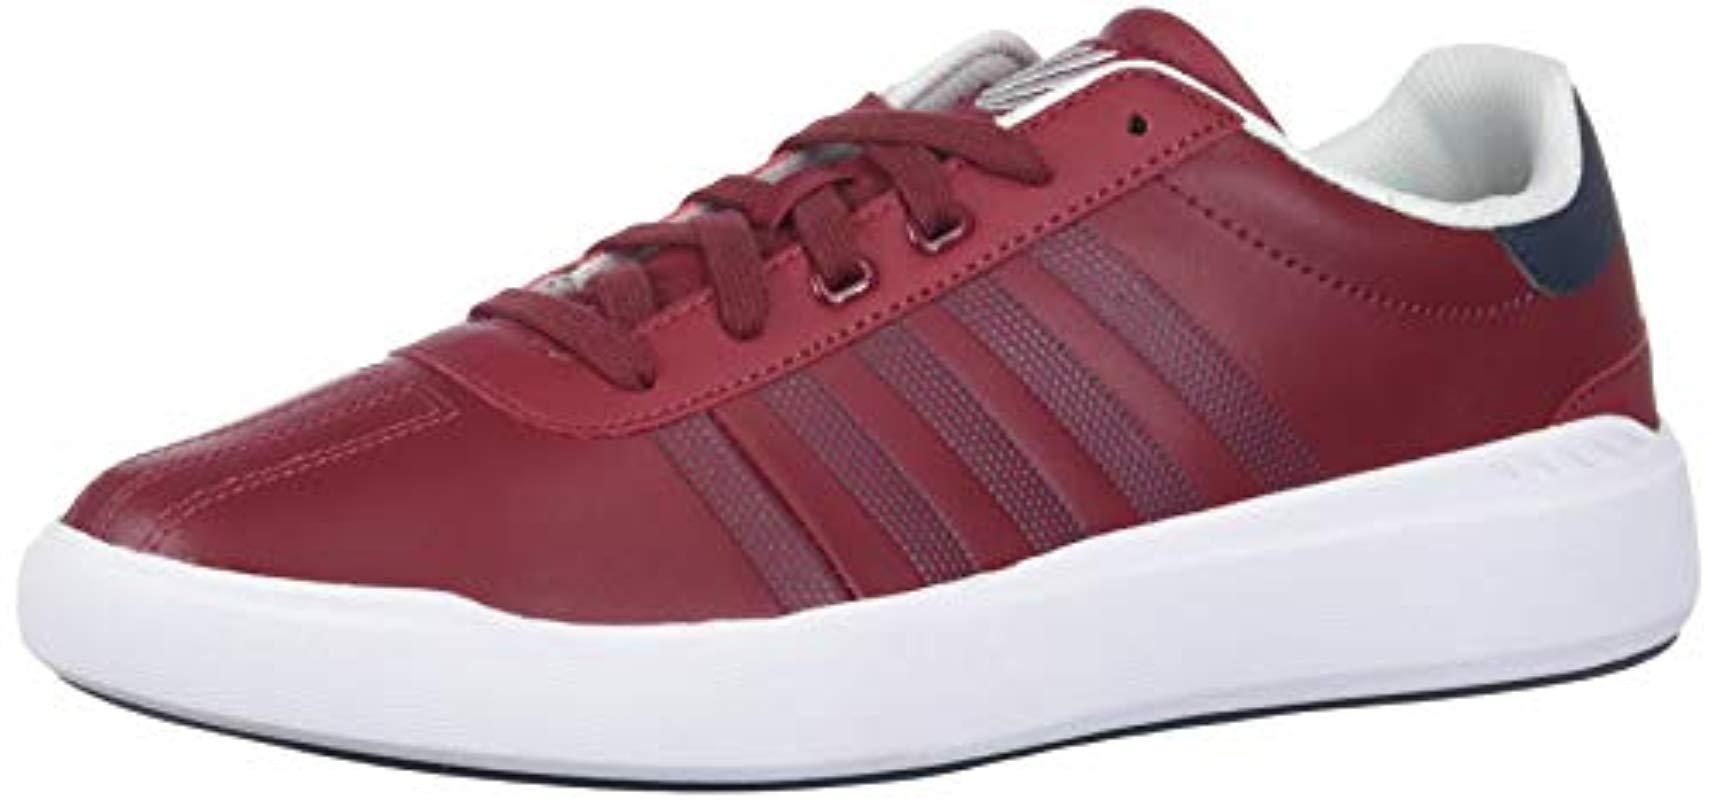 5b40f15fbea Men's Red Heritage Light L Sneaker